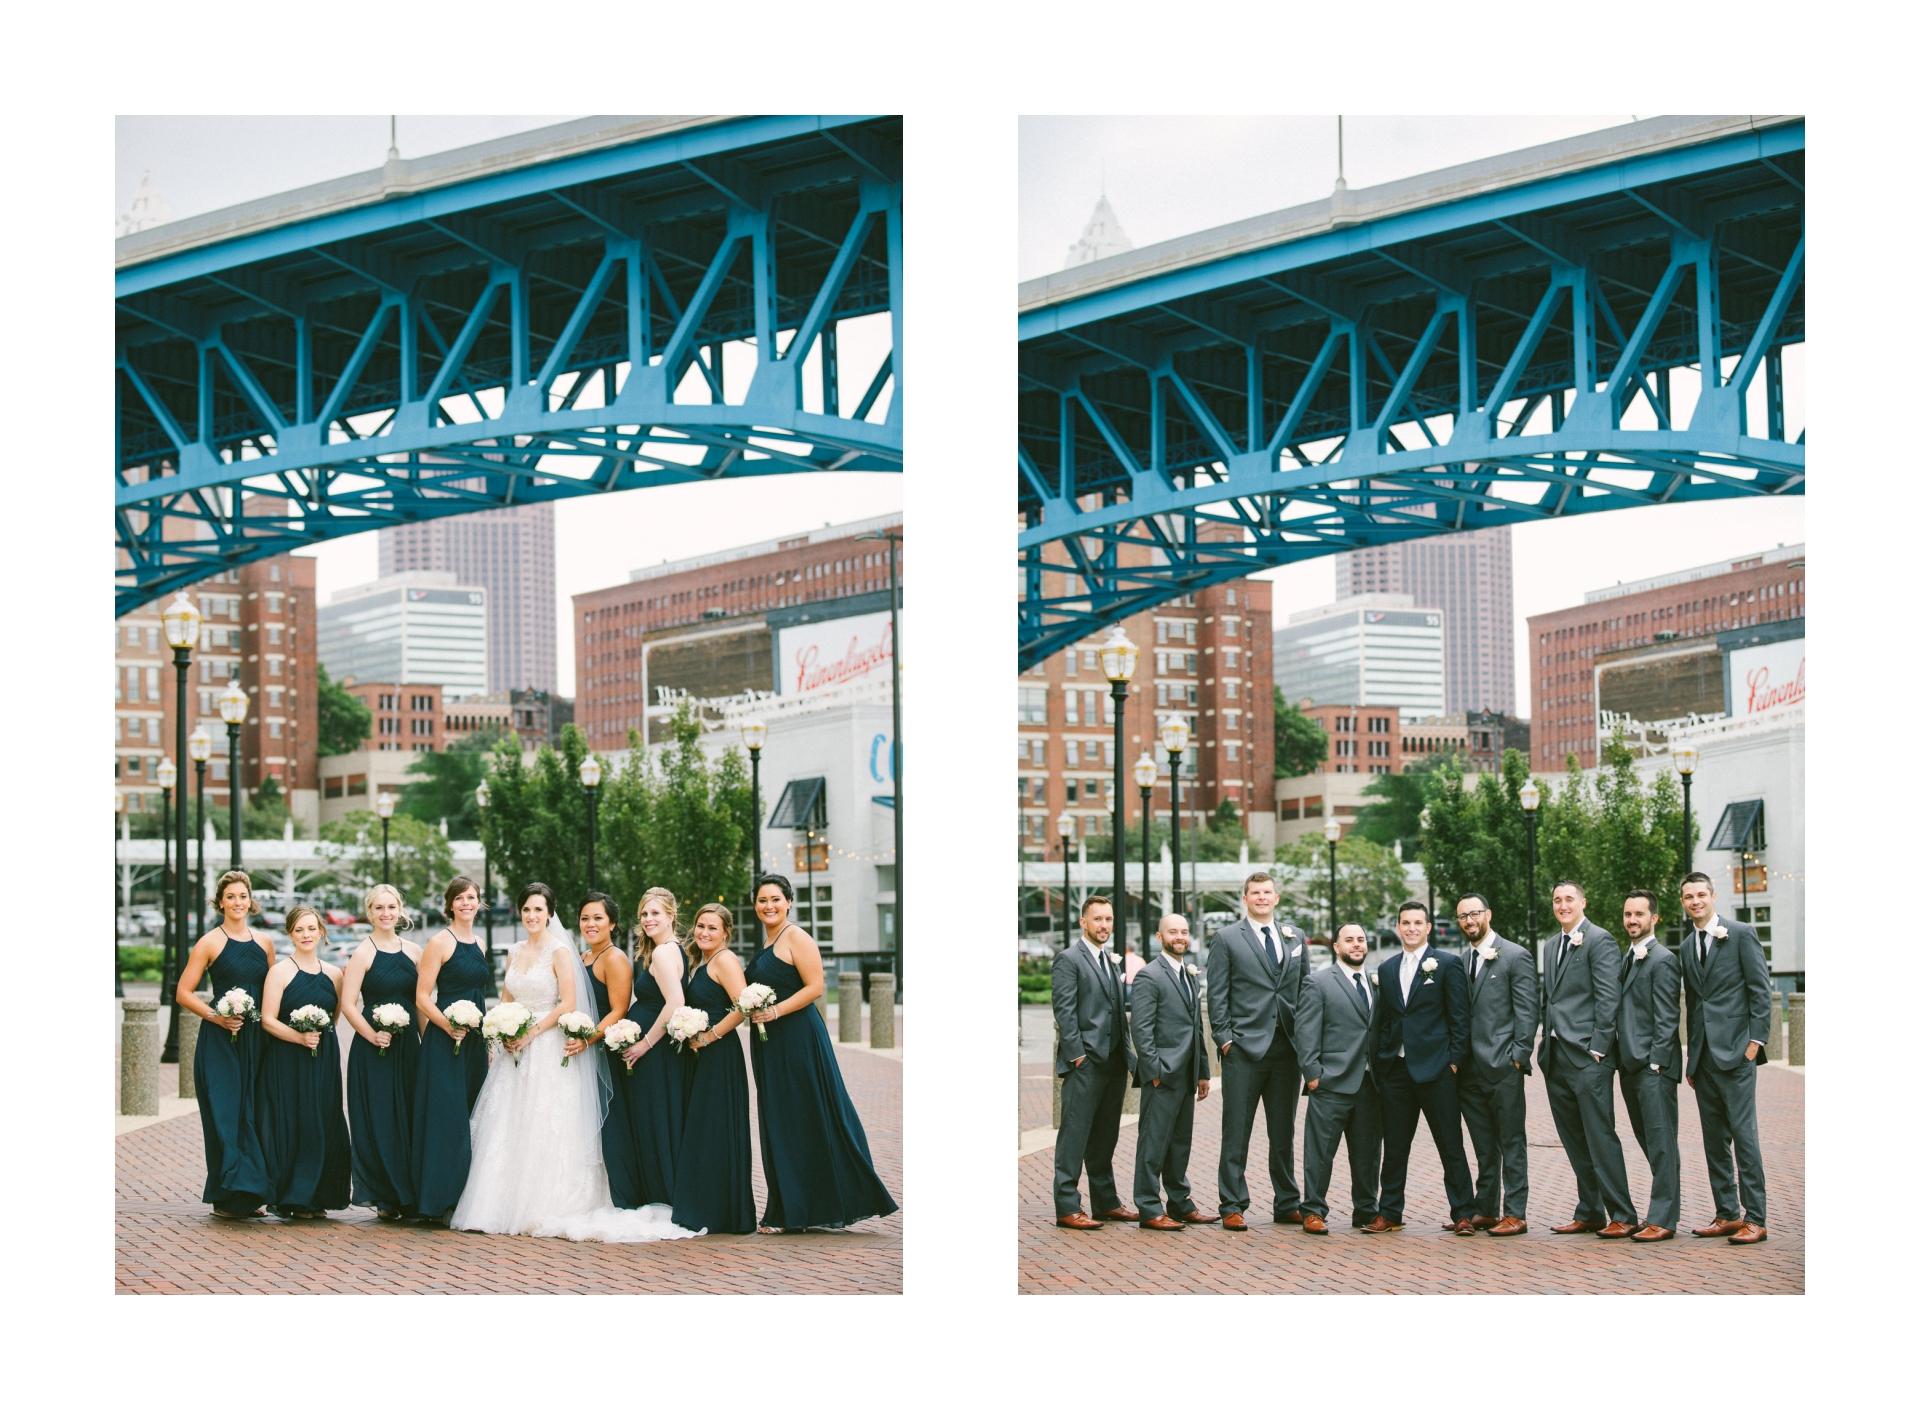 Intercontinental Hotel Wedding in Cleveland 2 23.jpg